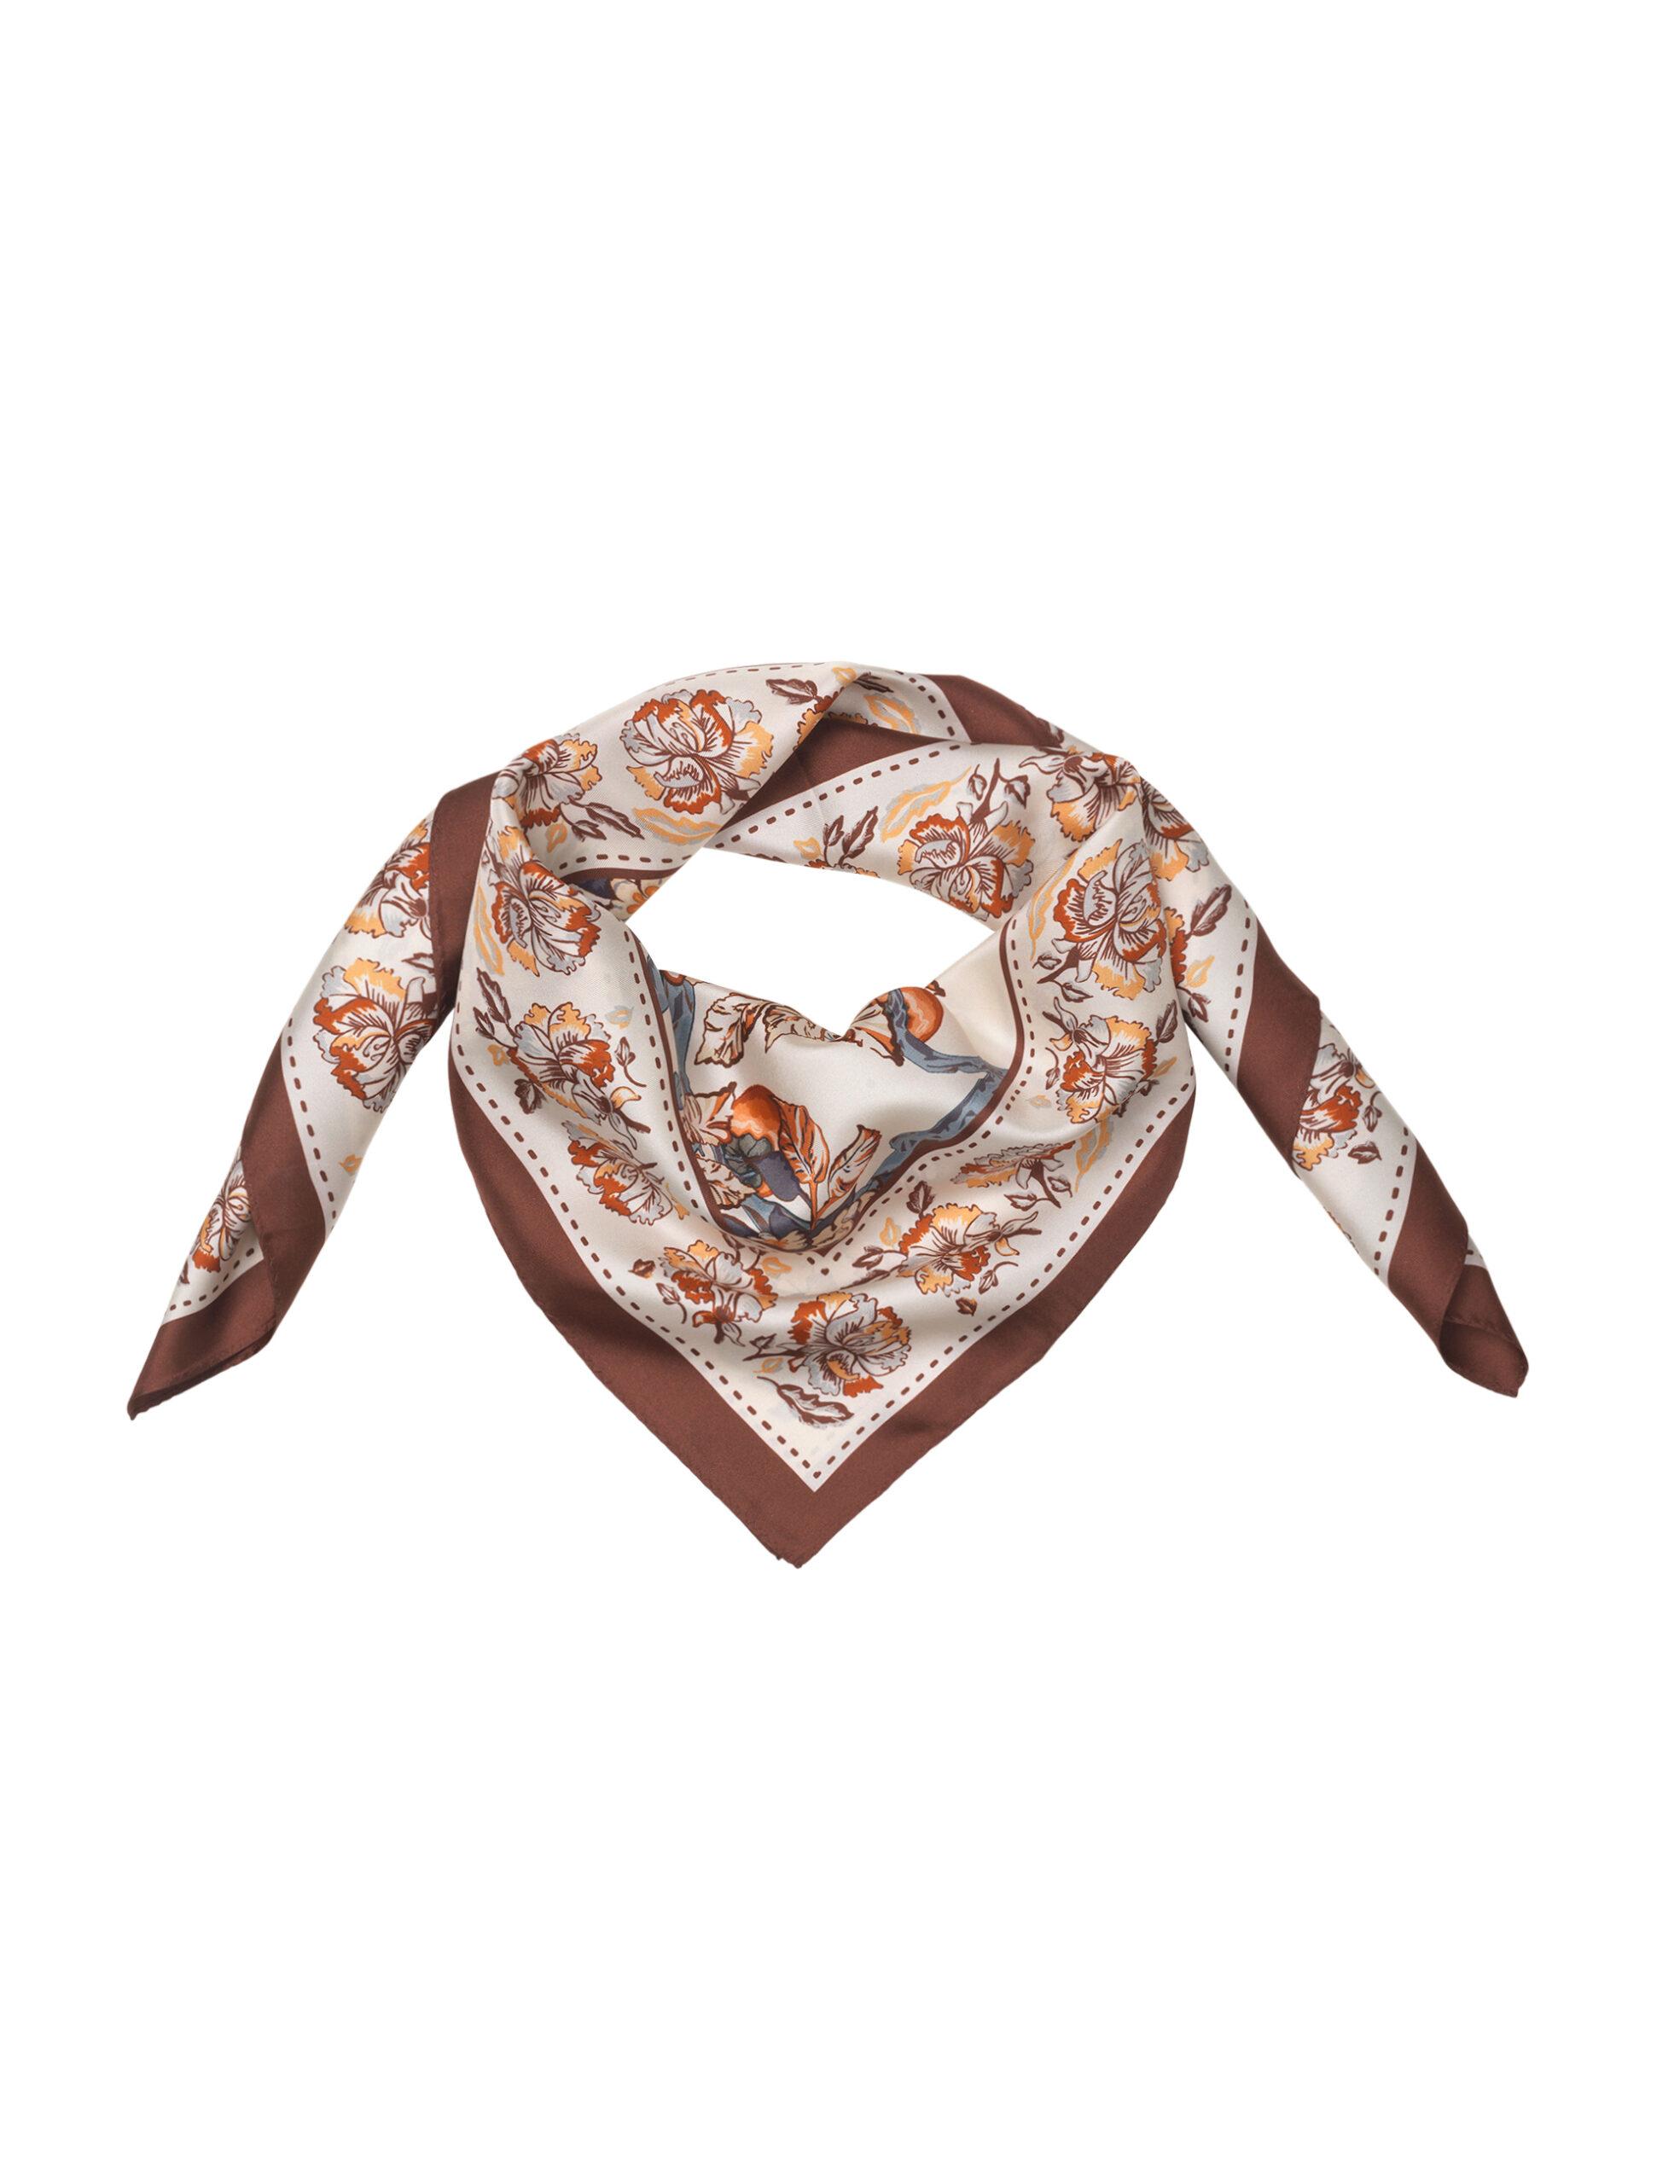 SILK SCARF – Rust flowers